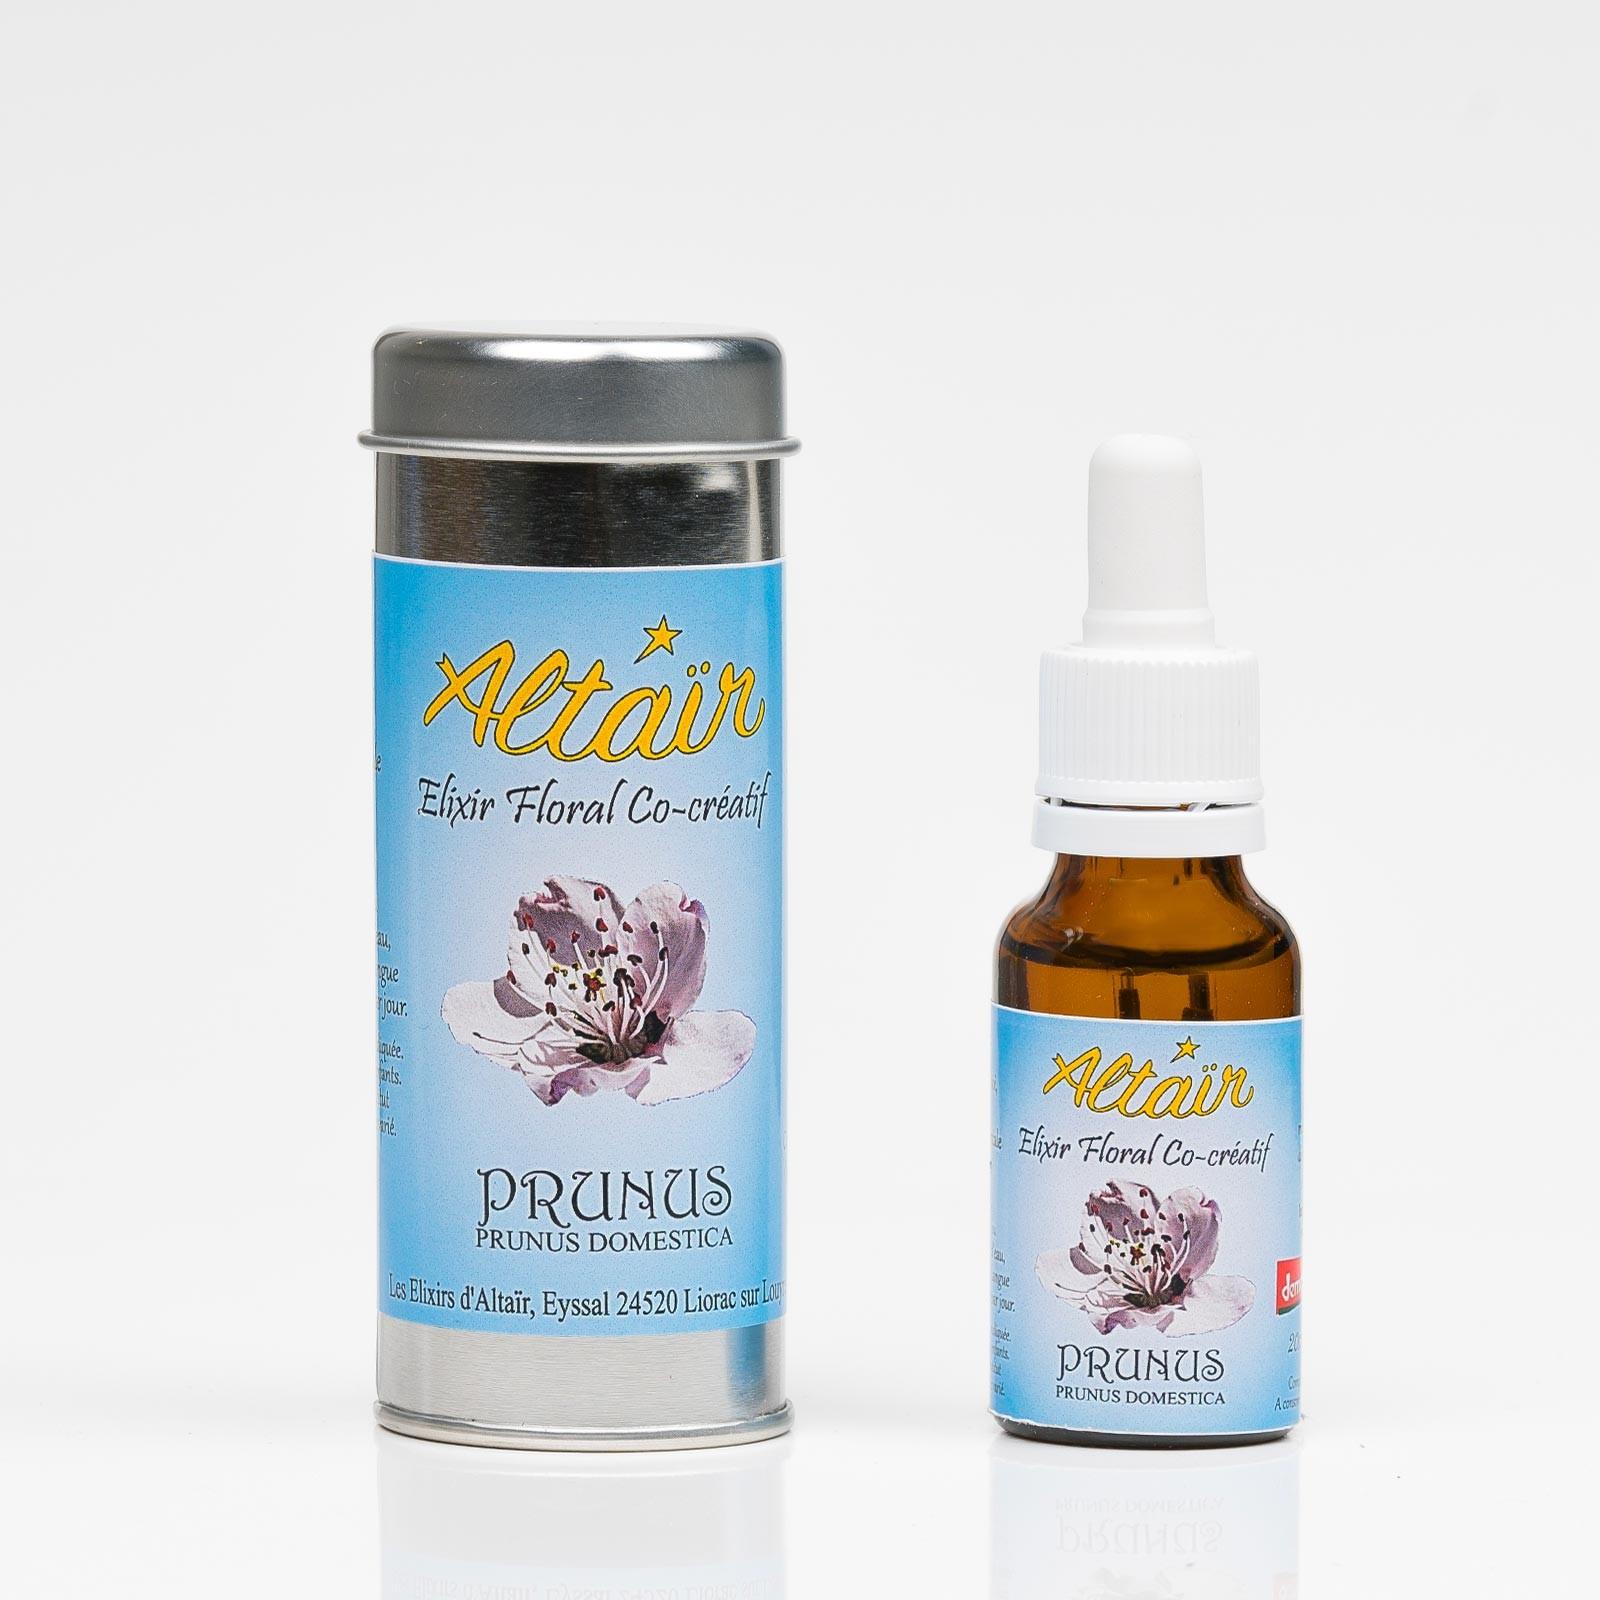 Prunus 330  Elixirs floraux